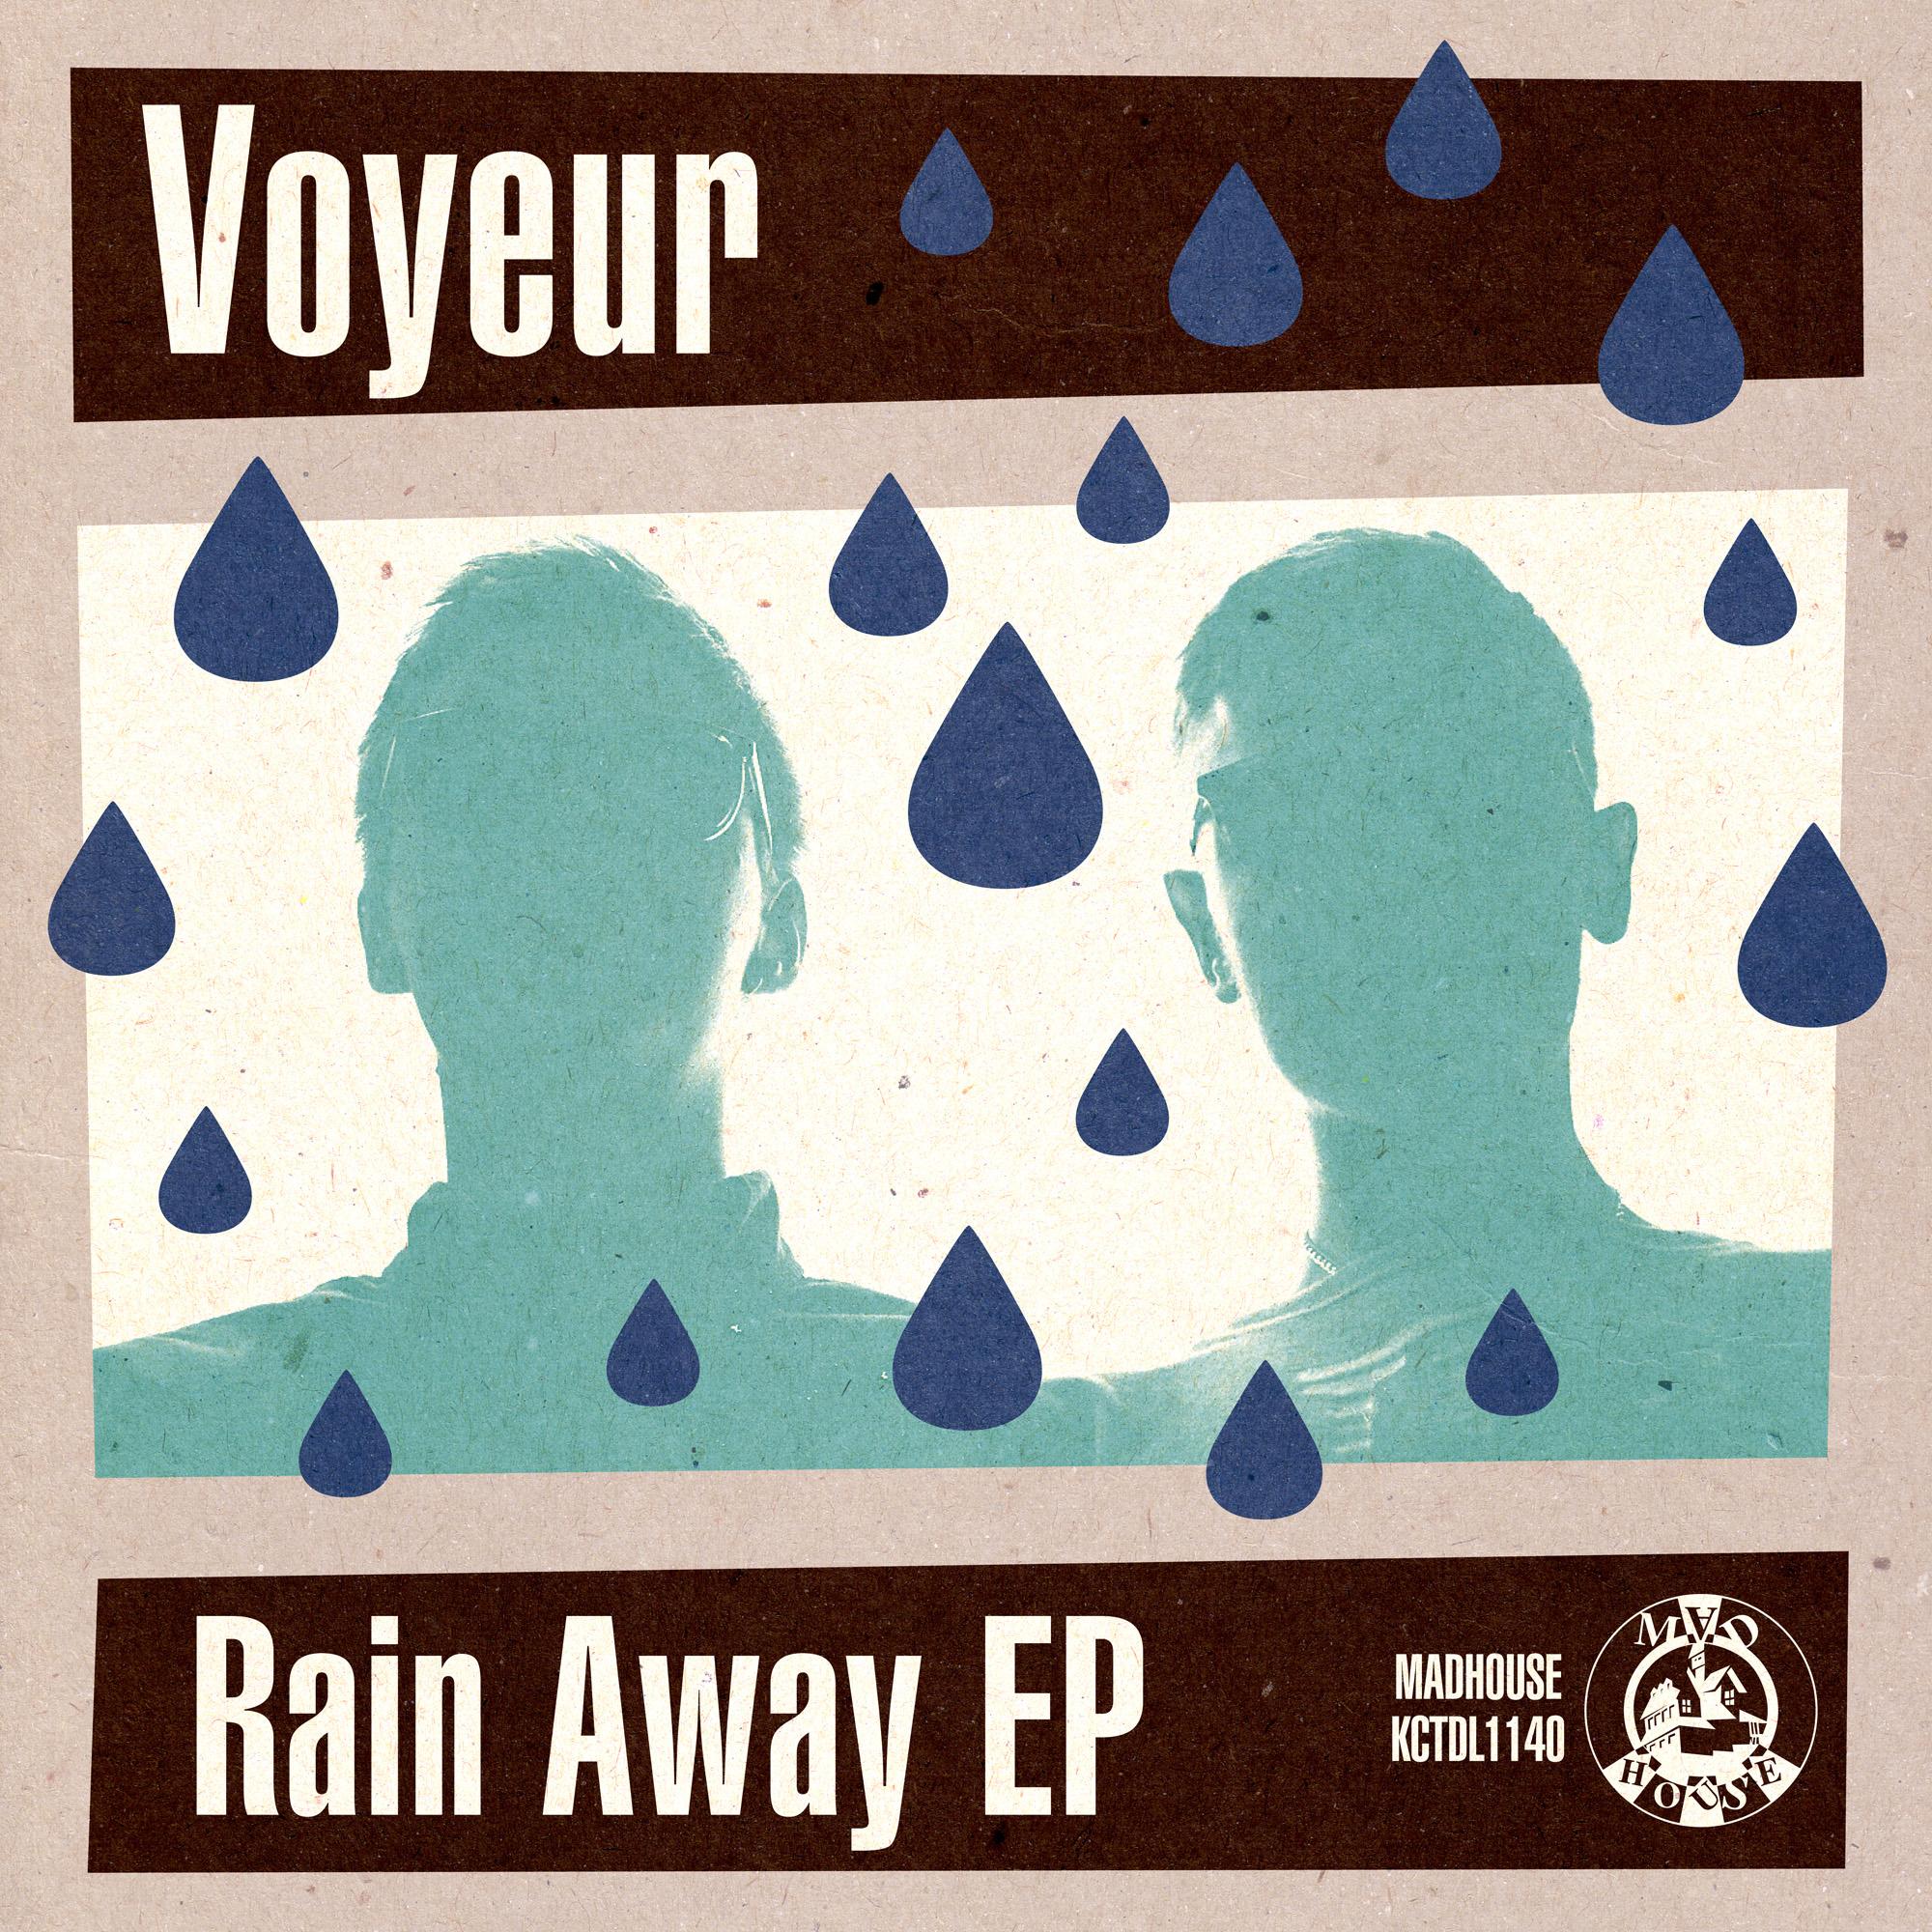 VOYEUR – RAIN AWAY EP